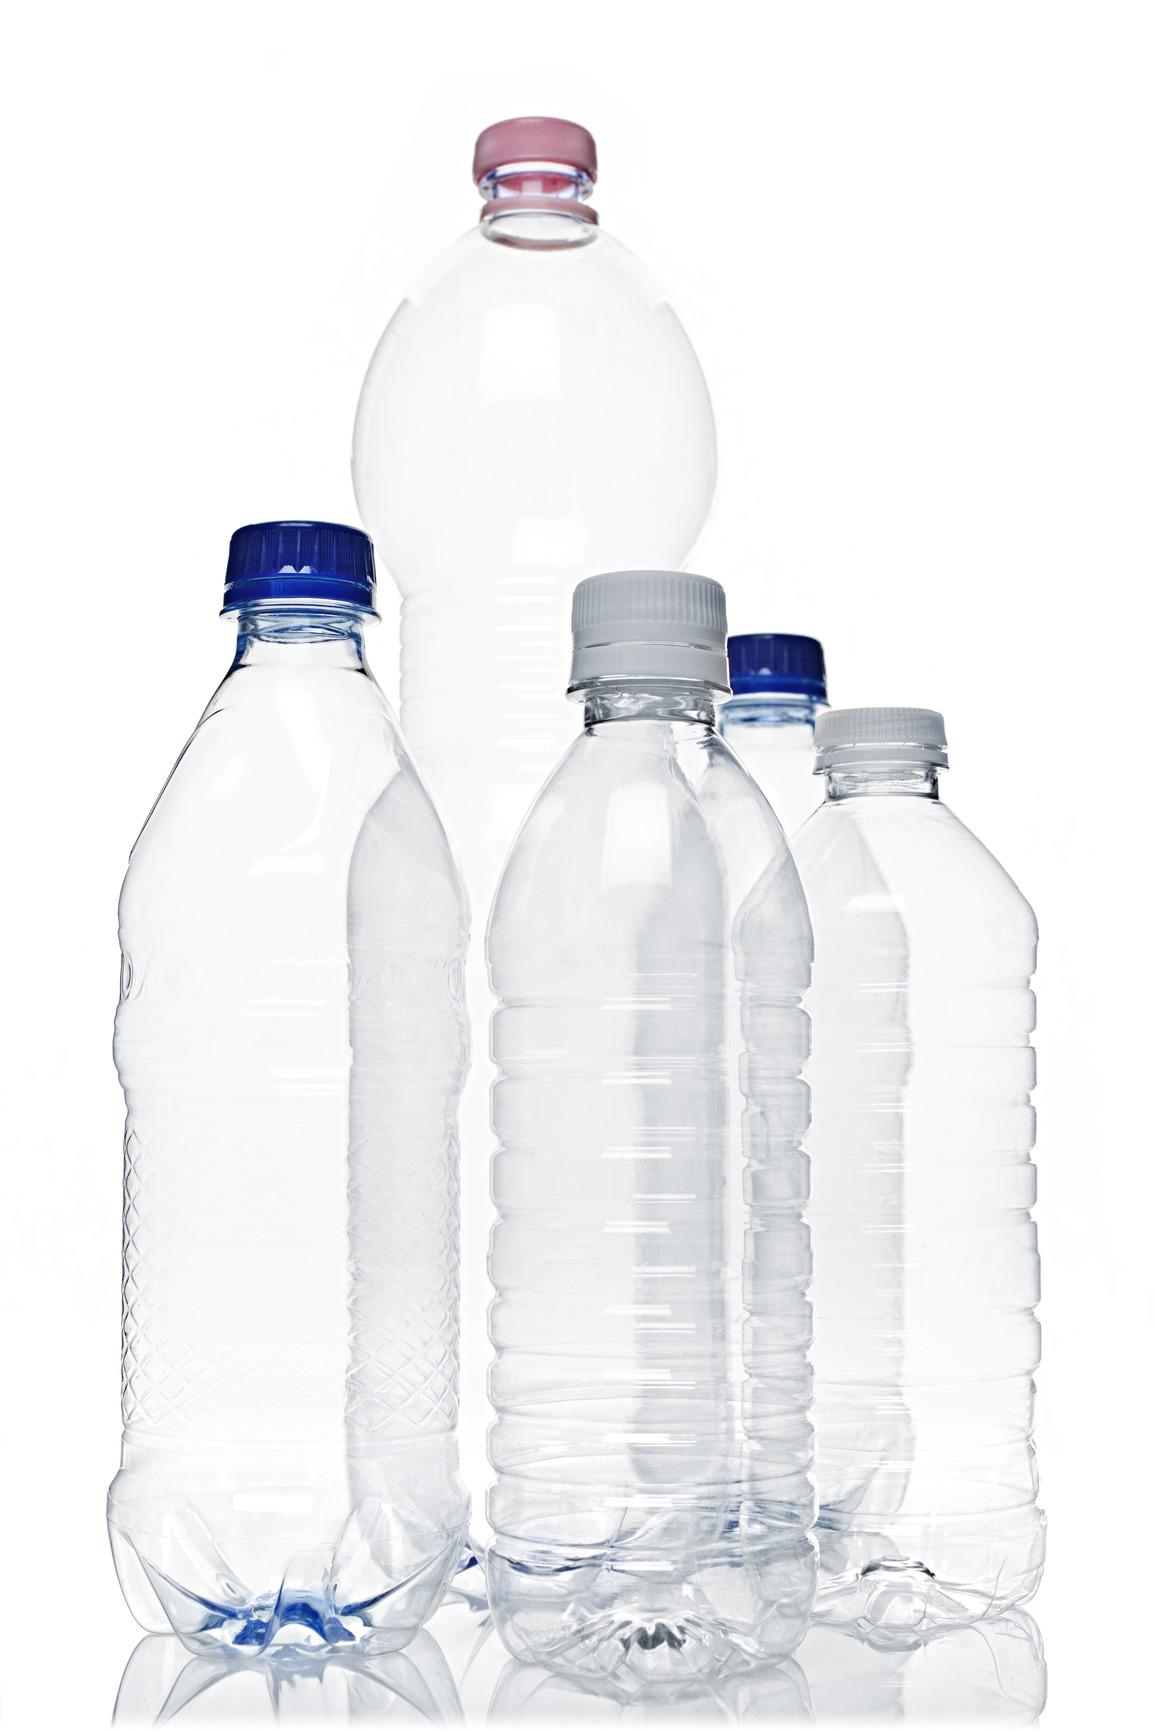 Photodune Empty Plastic Bottles